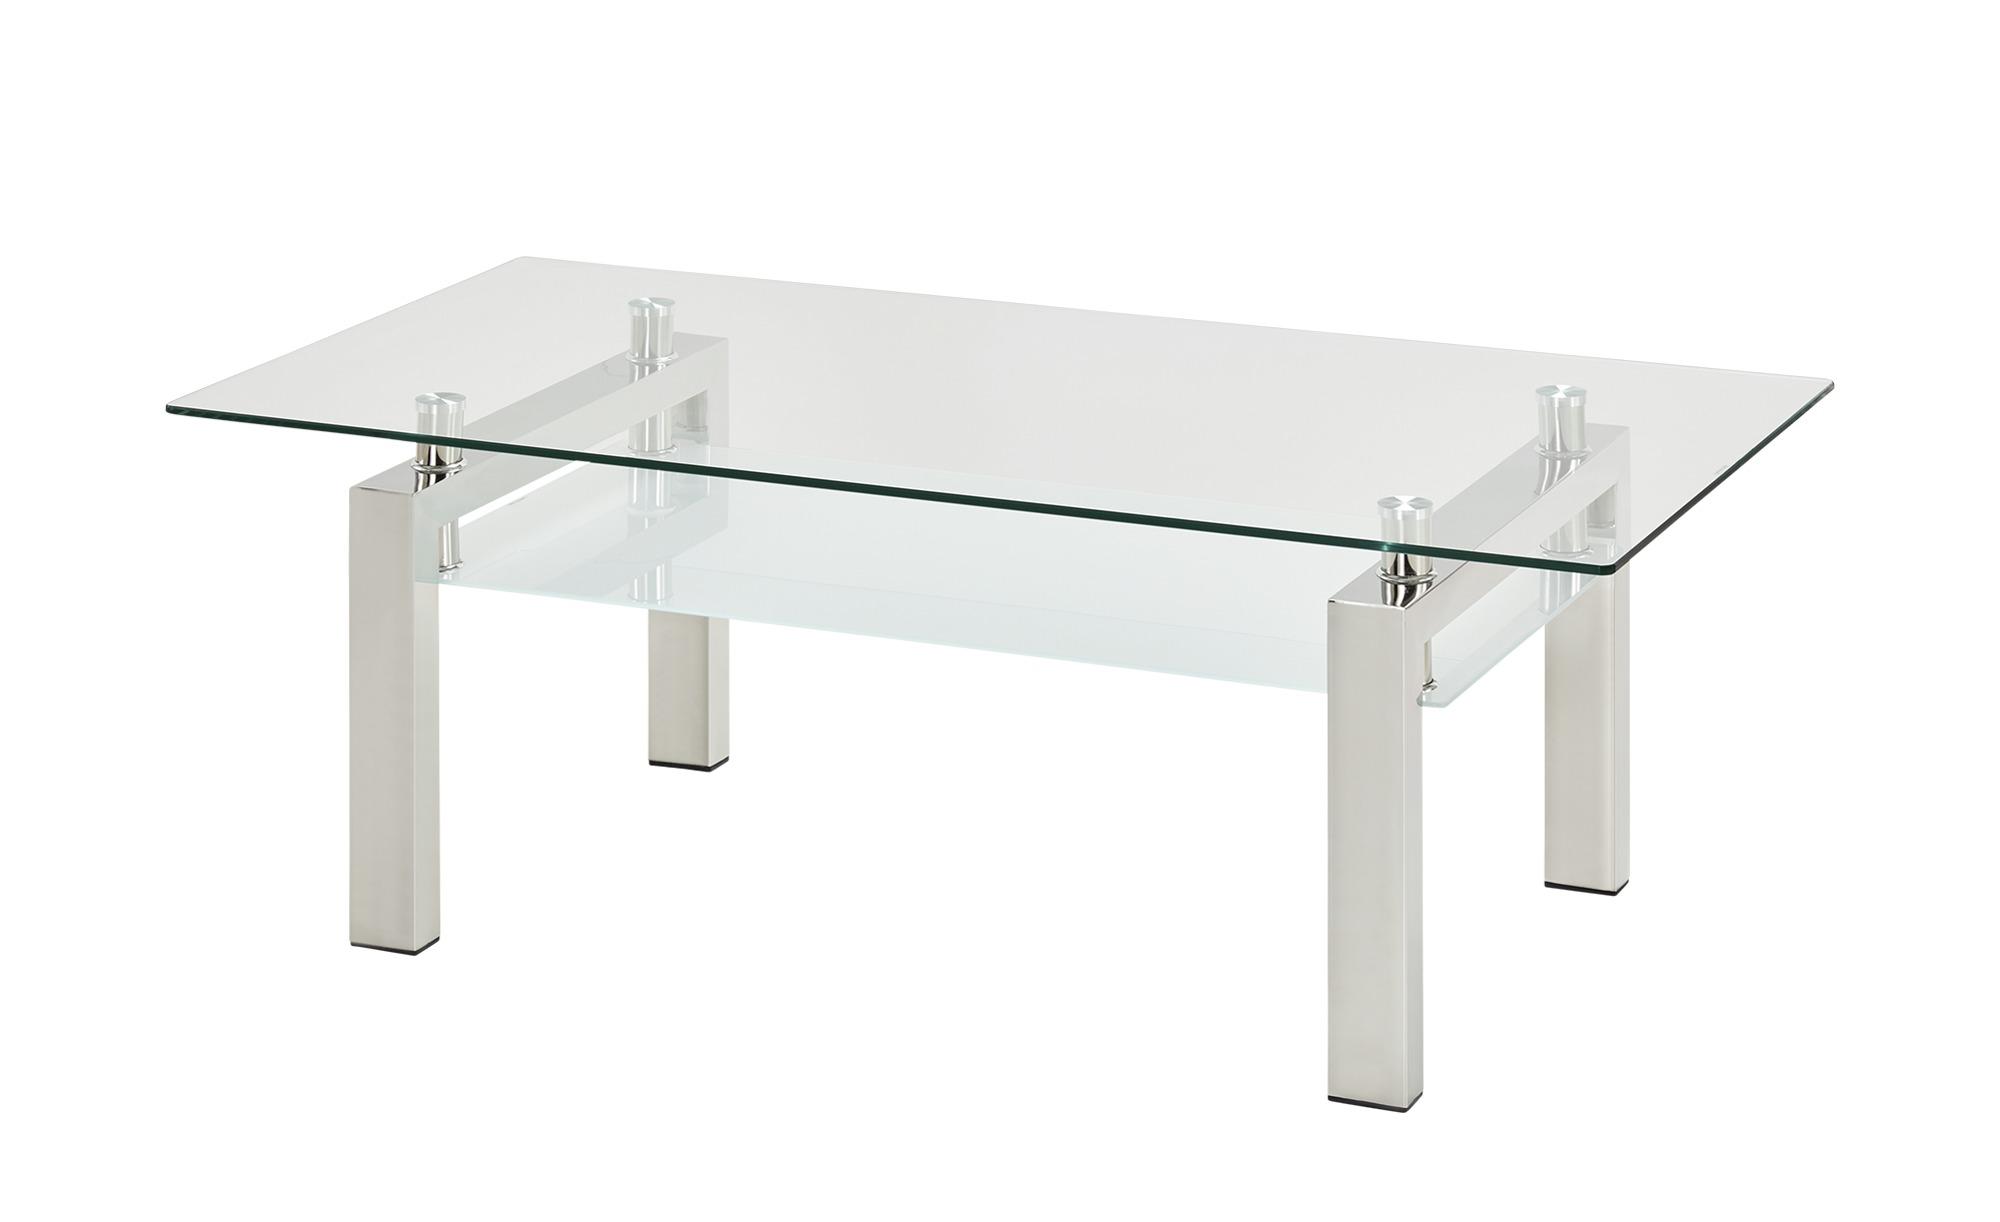 Couchtisch  Beno I ¦ transparent/klar ¦ Maße (cm): B: 60 H: 44 T: 60 Tische > Couchtische > Couchtische rechteckig - Höffner